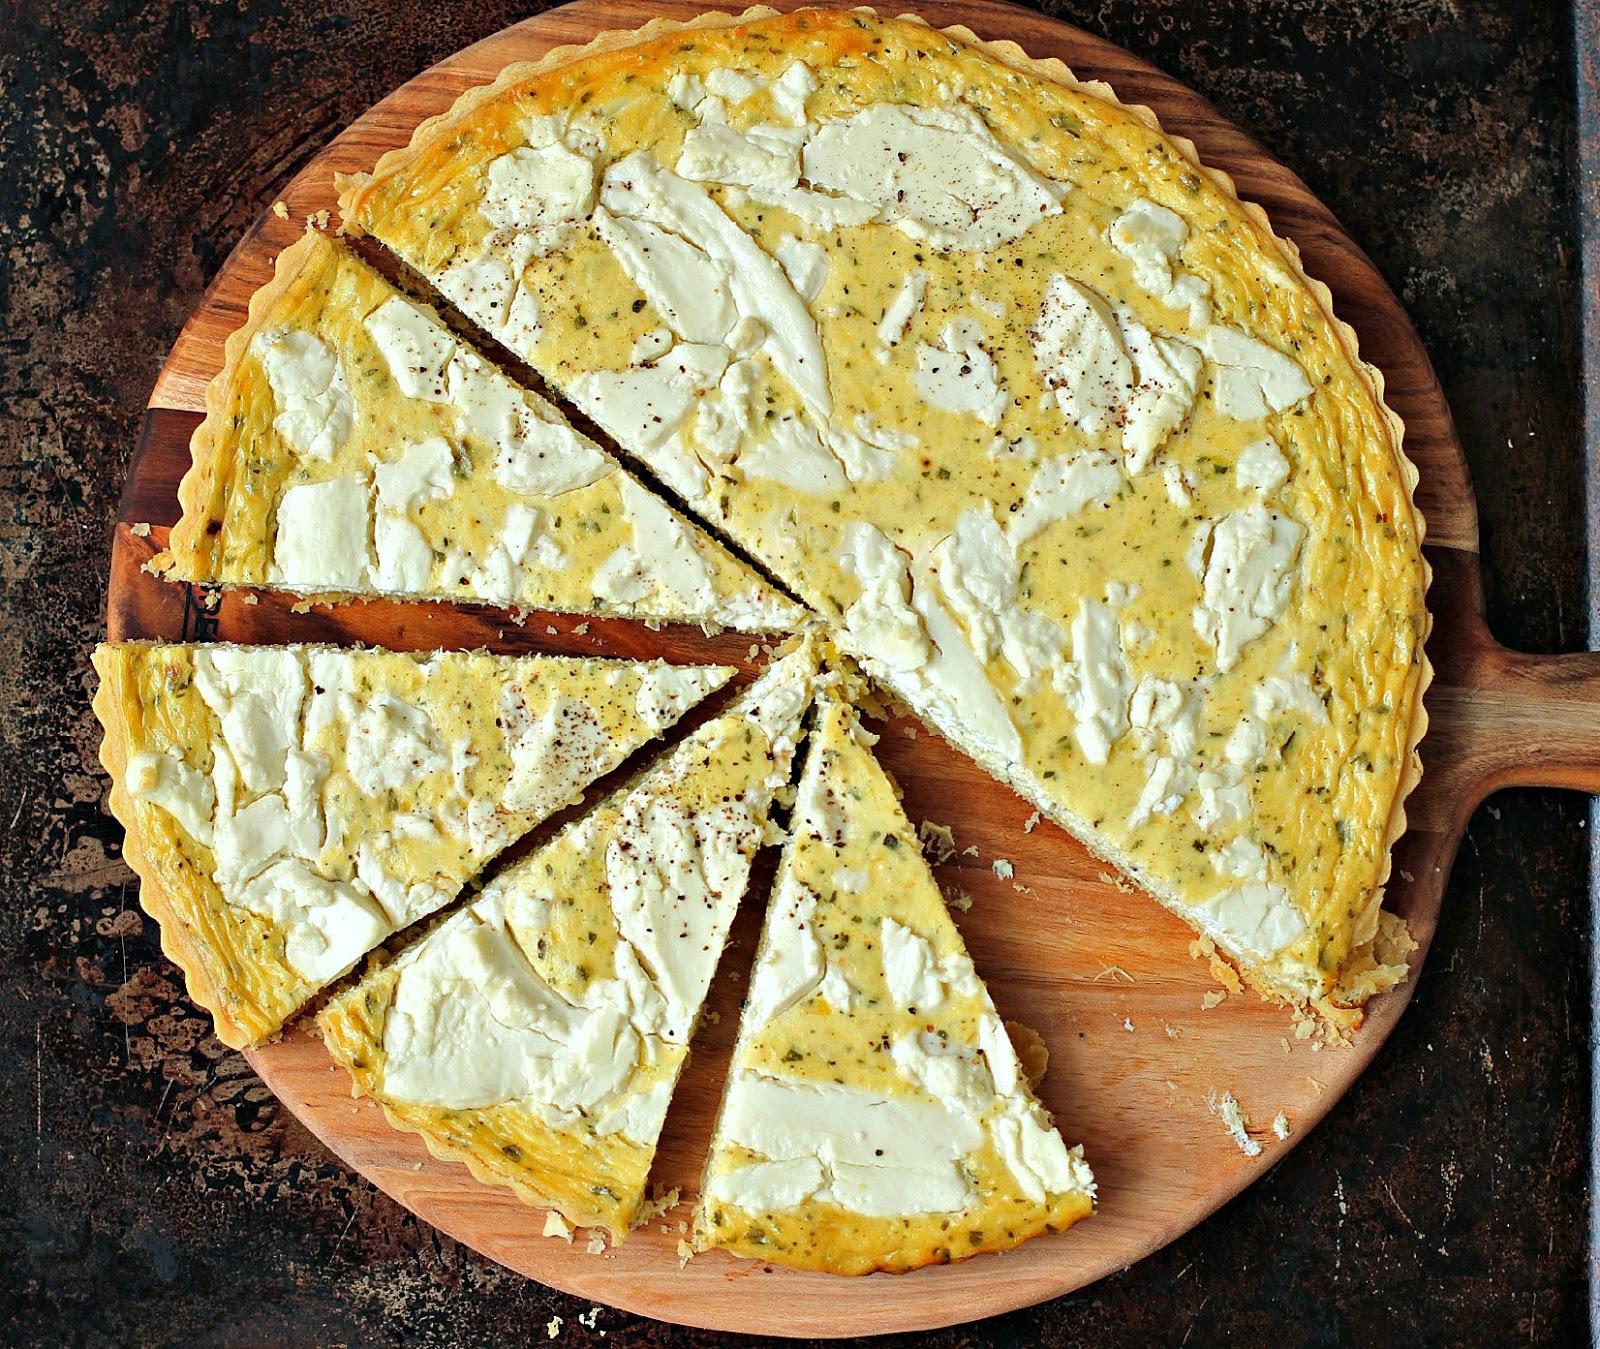 Milk and Honey: Leek, Creme Fraiche and Goat Cheese Tart